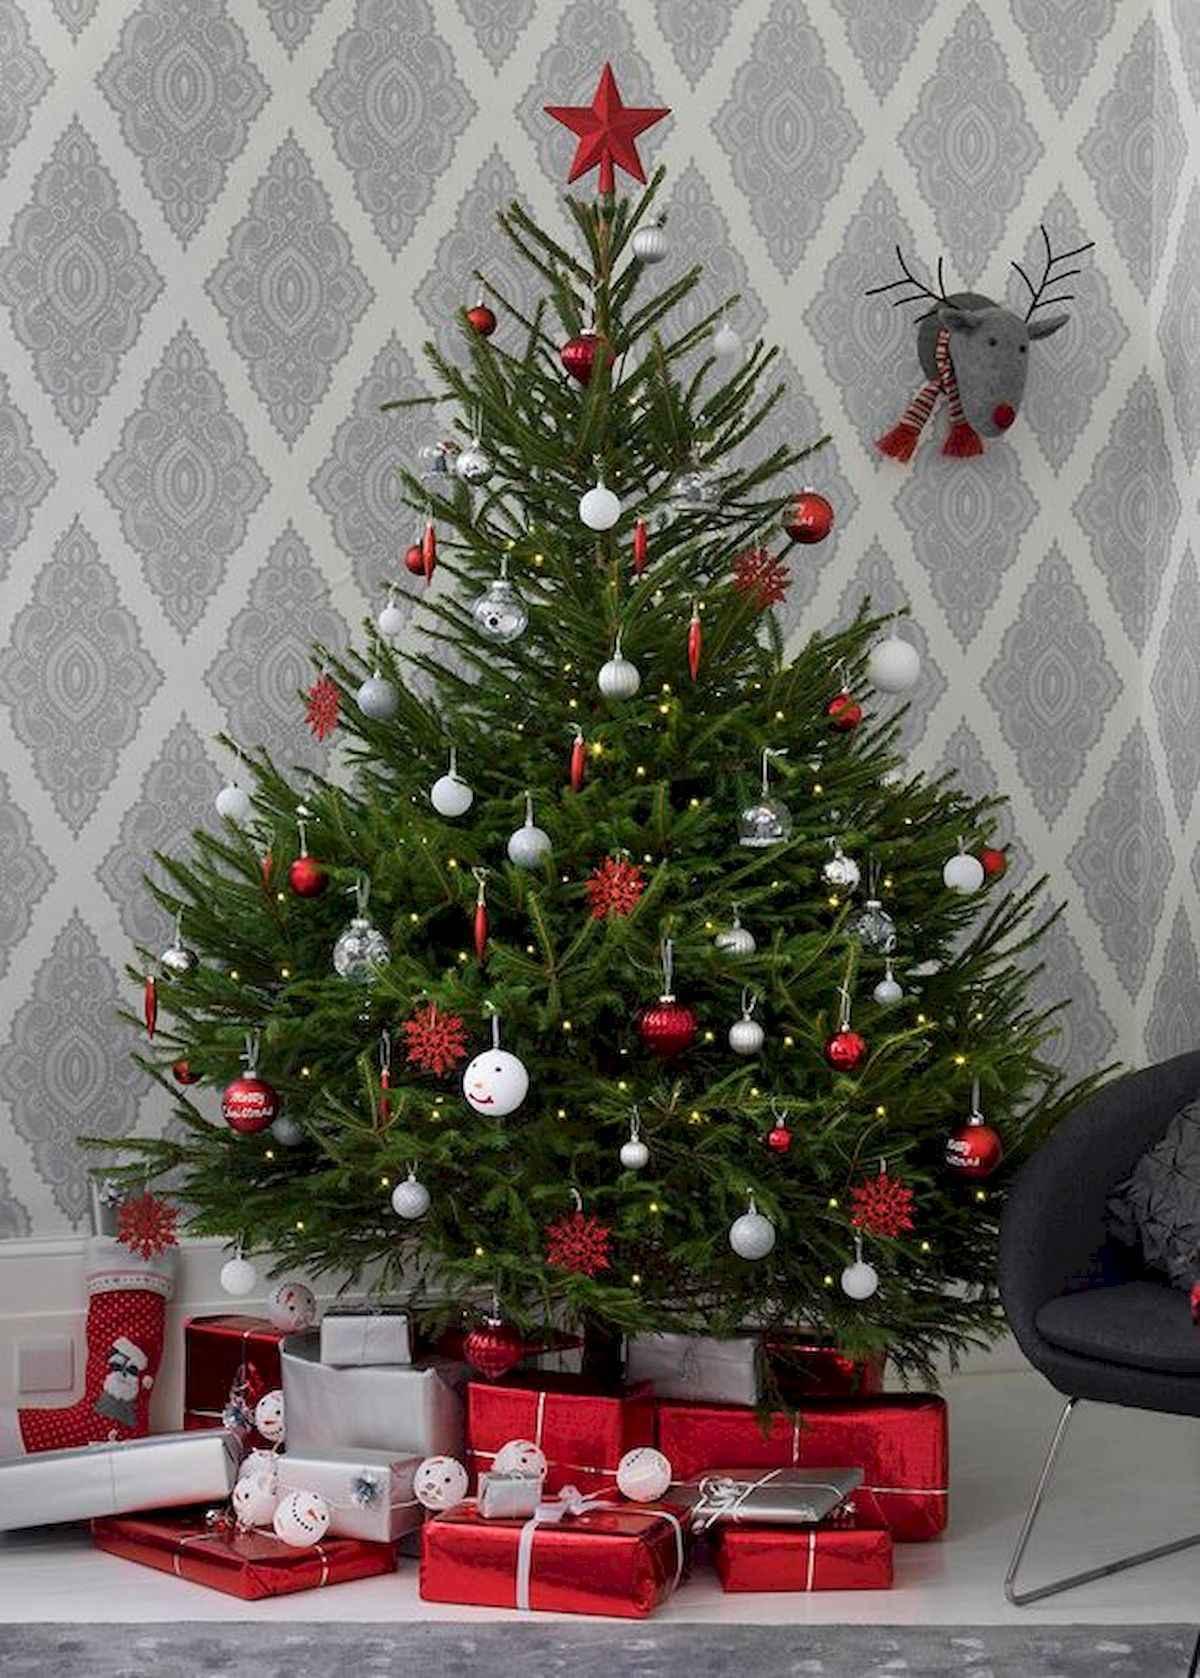 40 elegant christmas tree decorations ideas (27)